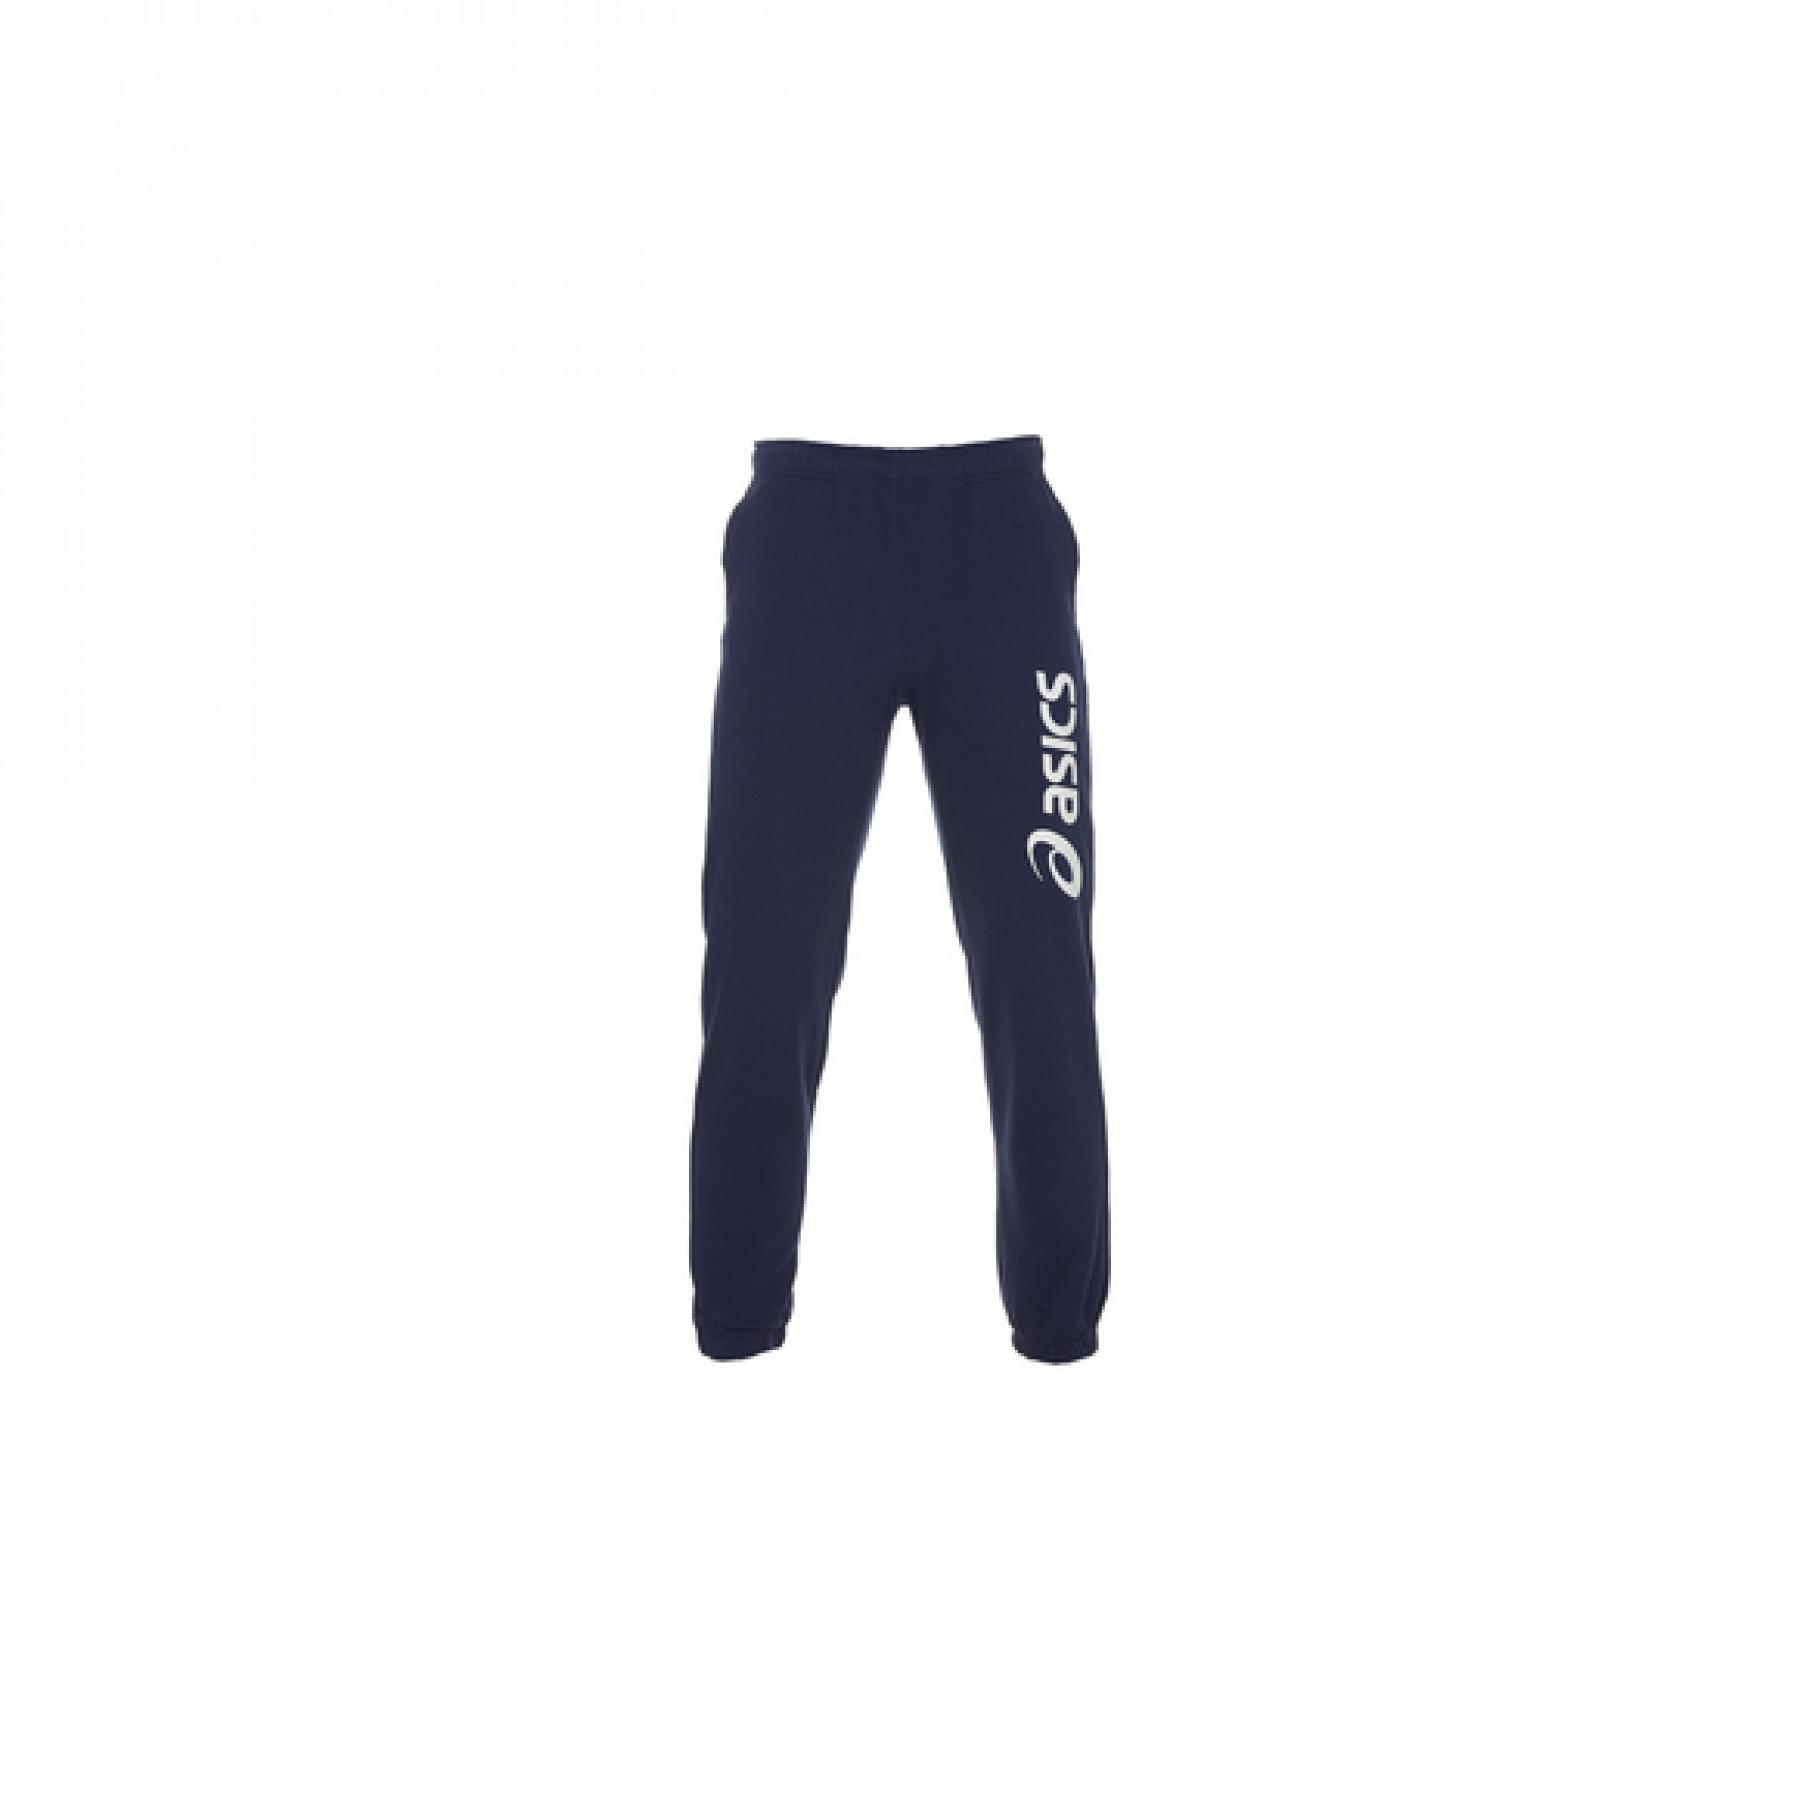 Pantalon Asics big logo sweat